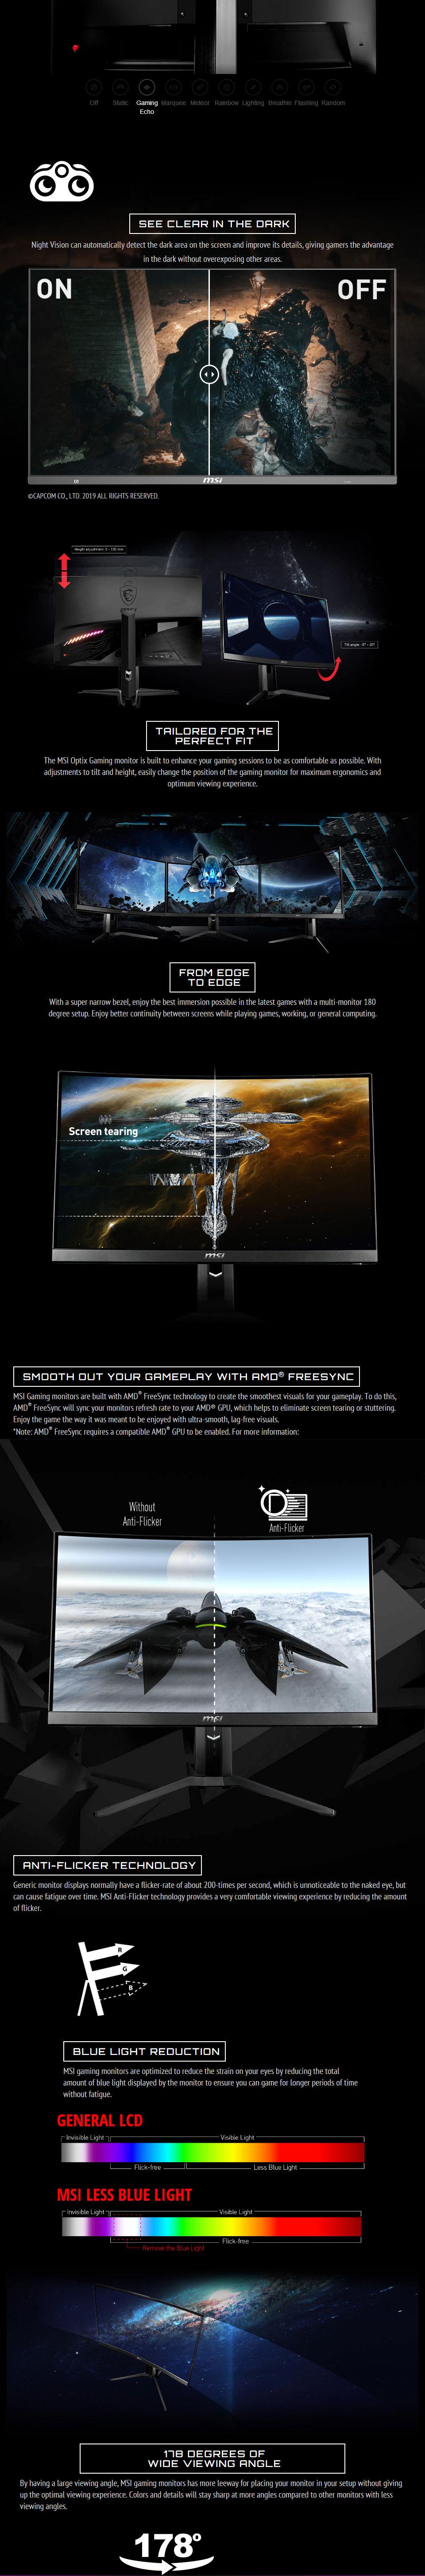 MSI Optix MAG322CQRV QHD 144Hz Curved 32in VA Gaming Monitor